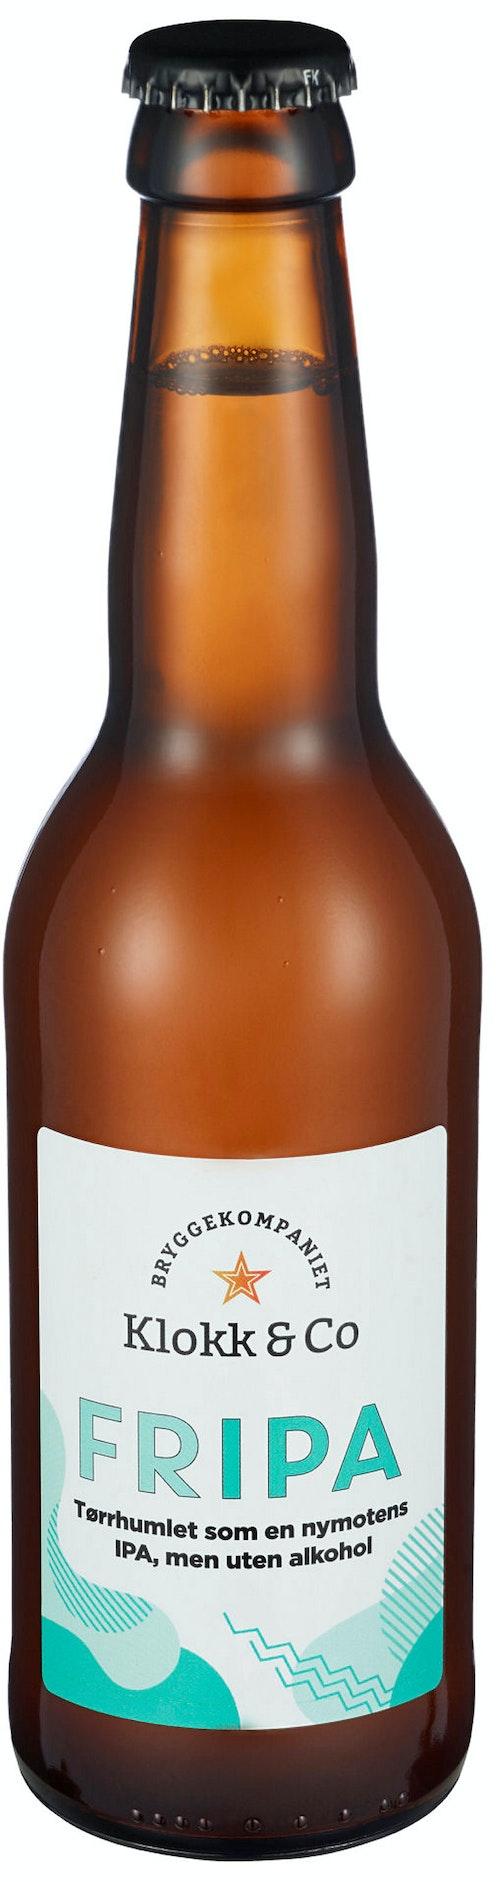 Klokk & Co FRIPA Alkoholfri IPA, 0,33 l